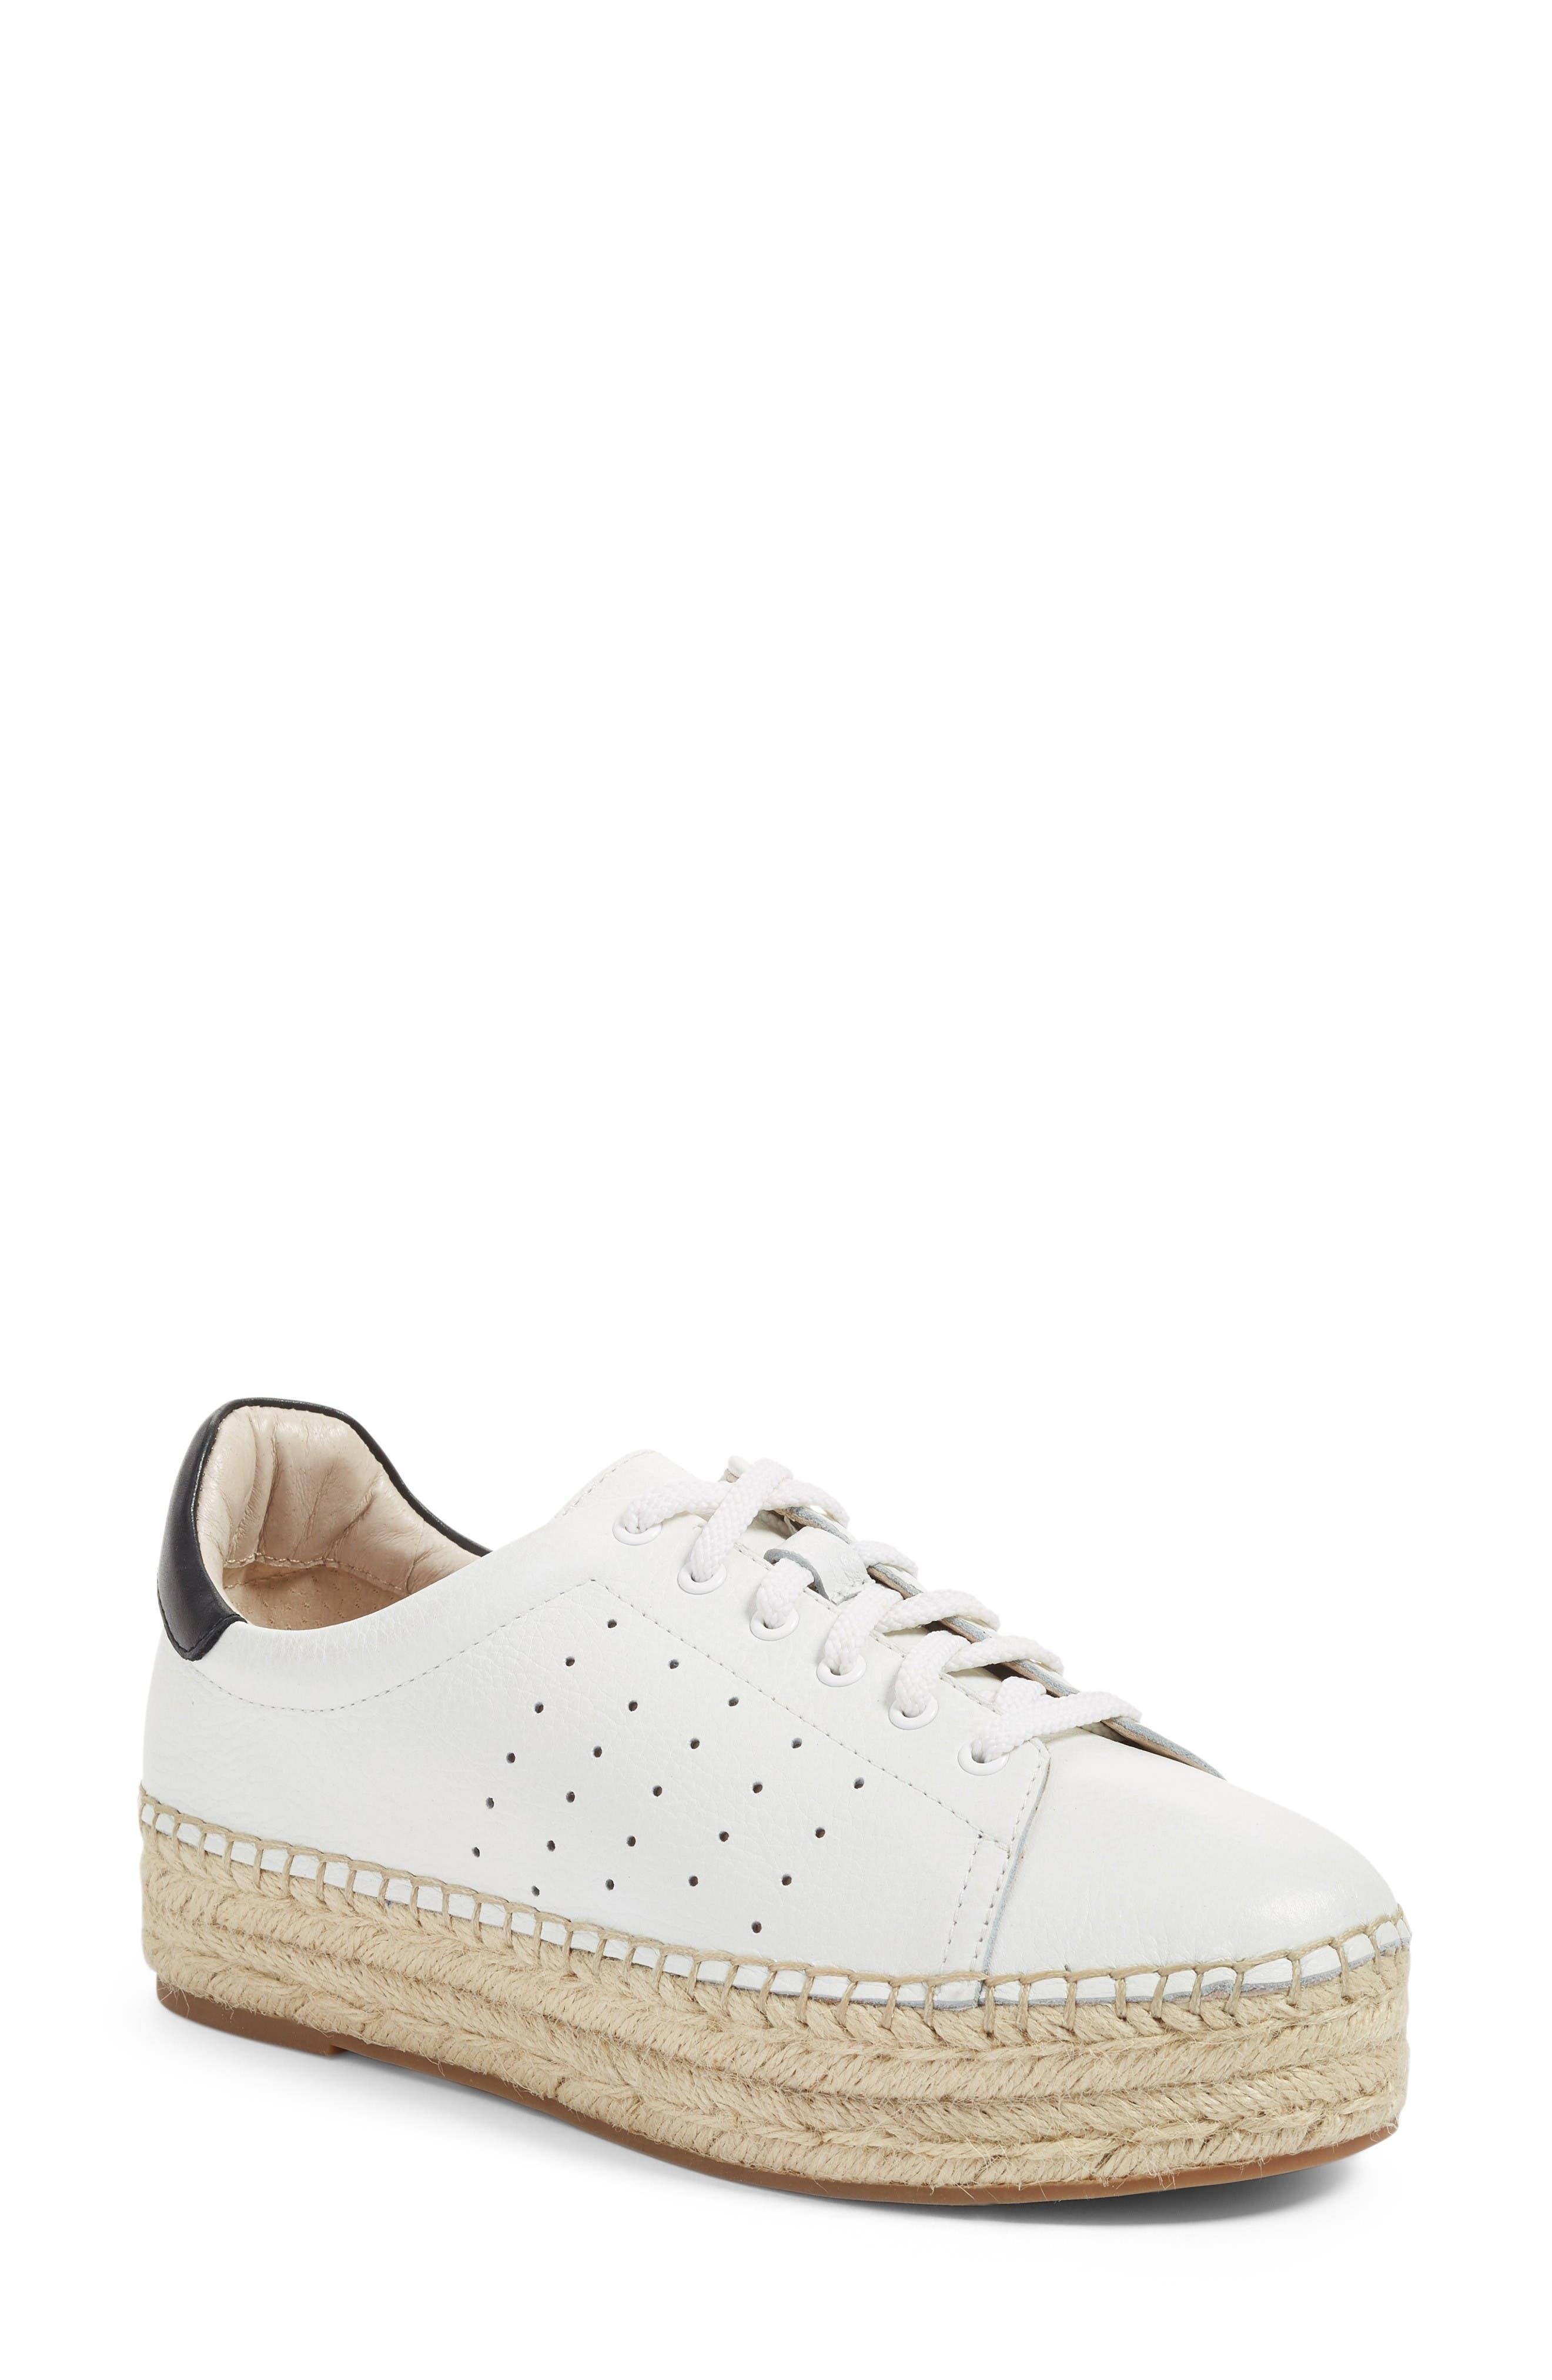 Alternate Image 1 Selected - Vince Camuto Jinnie Platform Sneaker (Women)